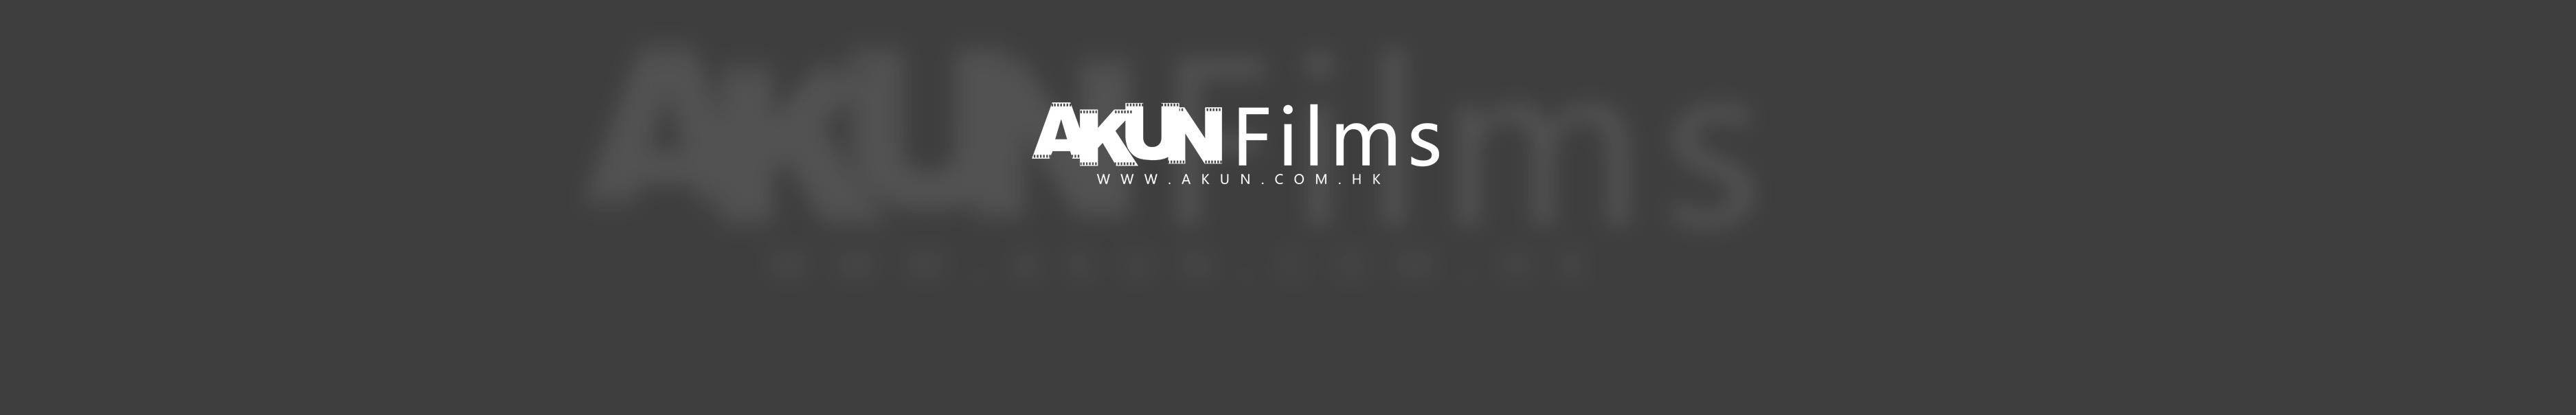 AKUNFILMS banner